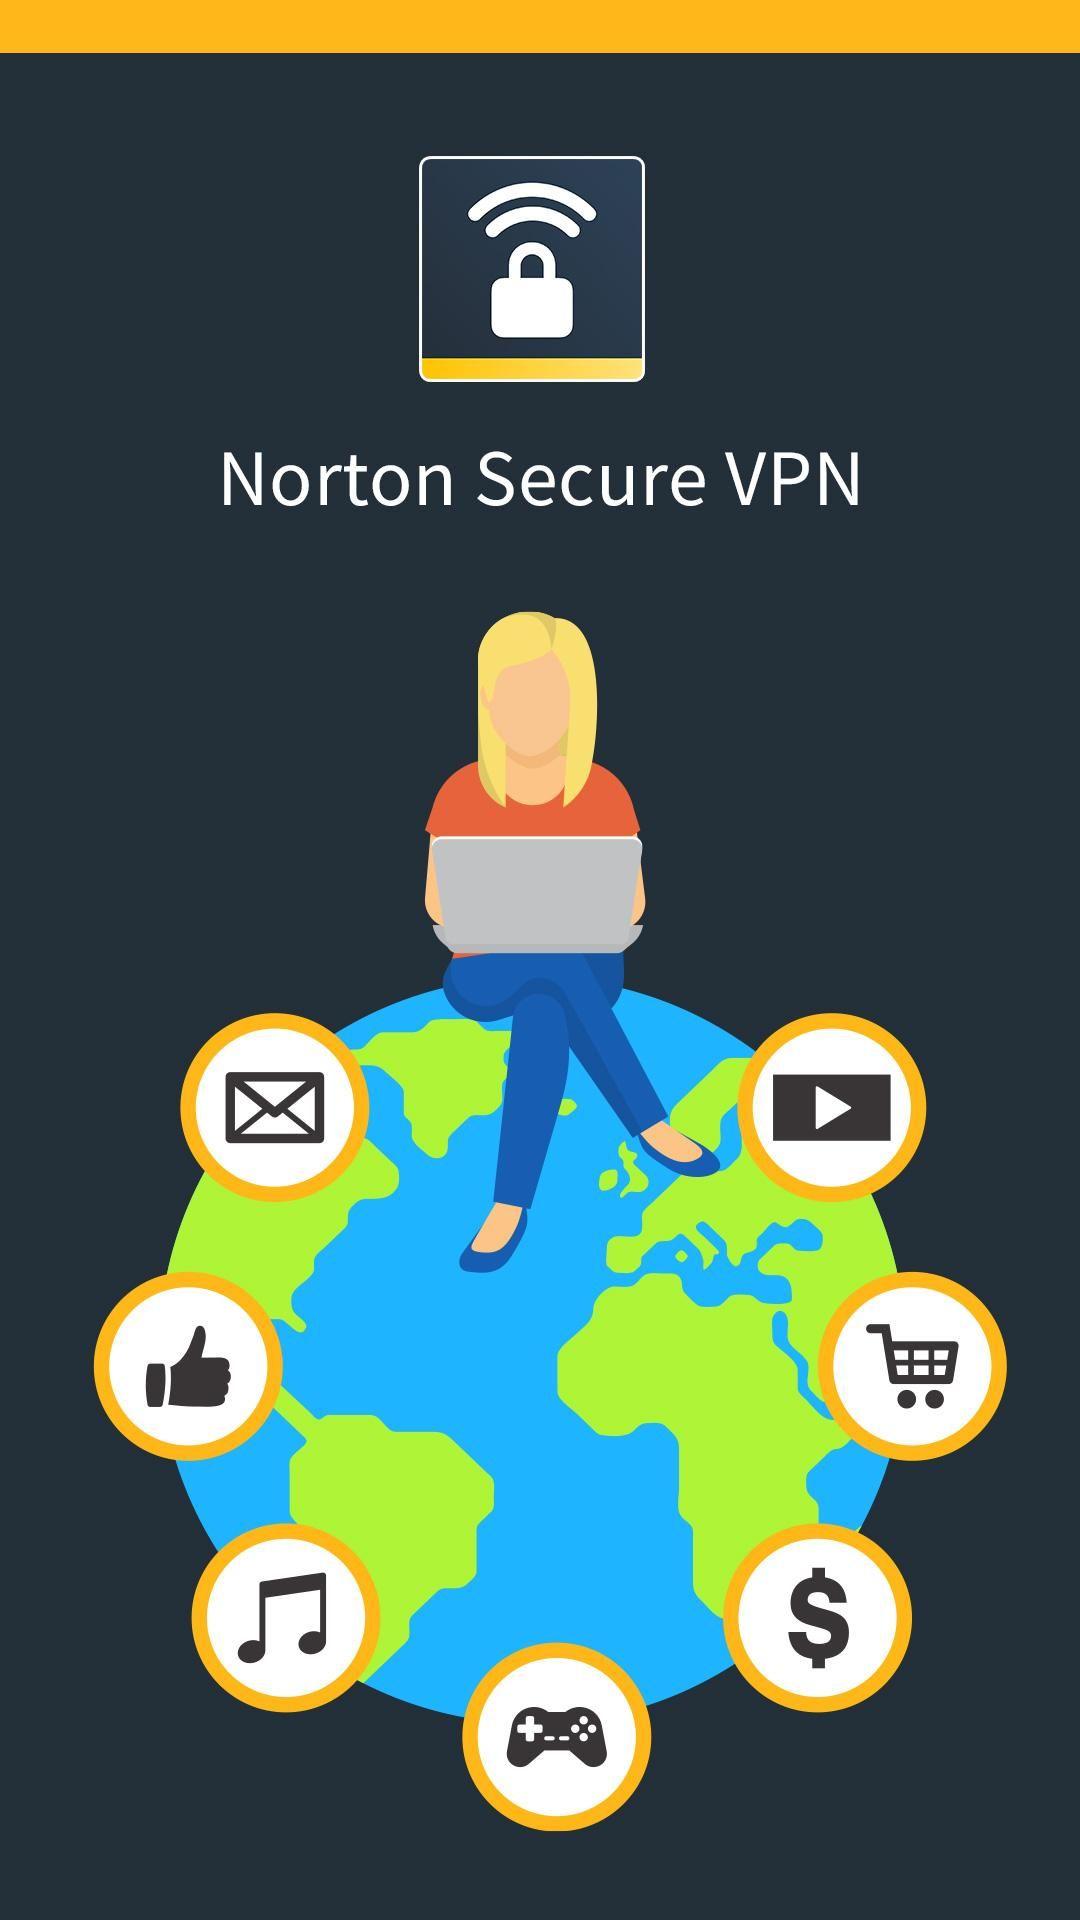 ba19904ca6f5c7fcb7d6add719841452 - How To Use Secure Vpn App